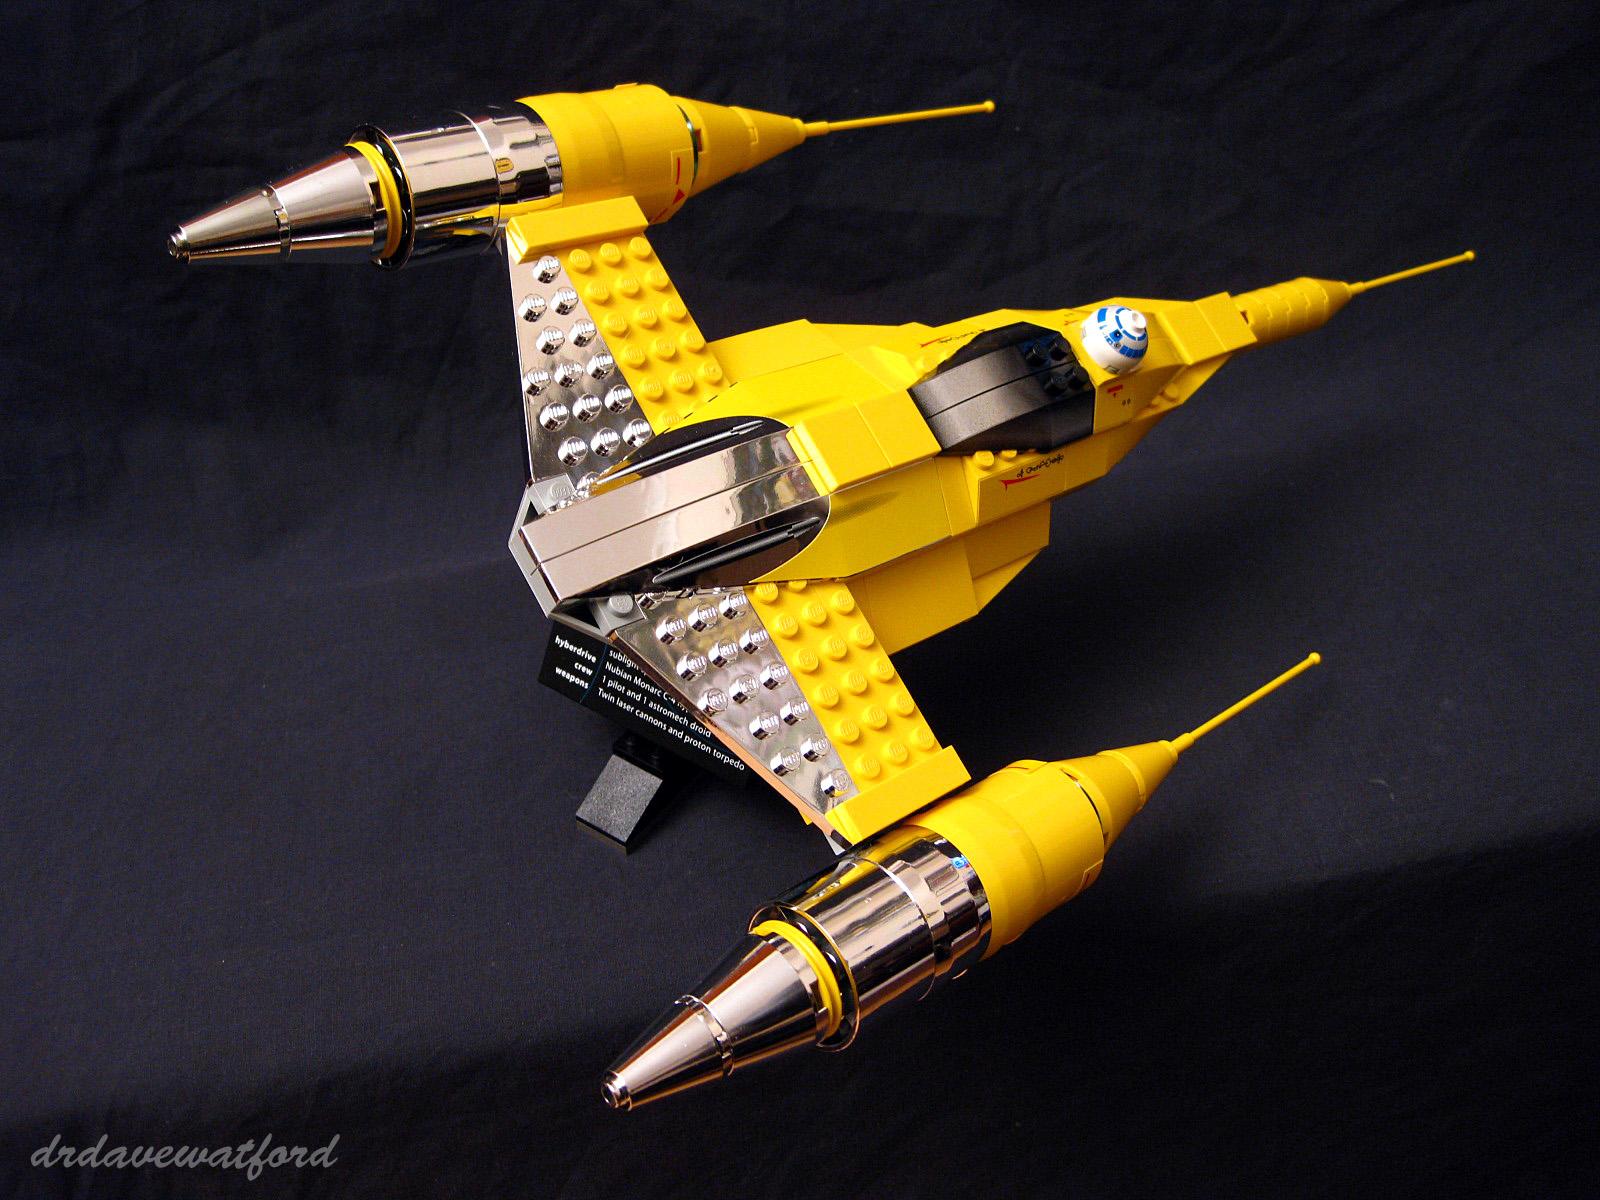 lego naboo starfighter instructions